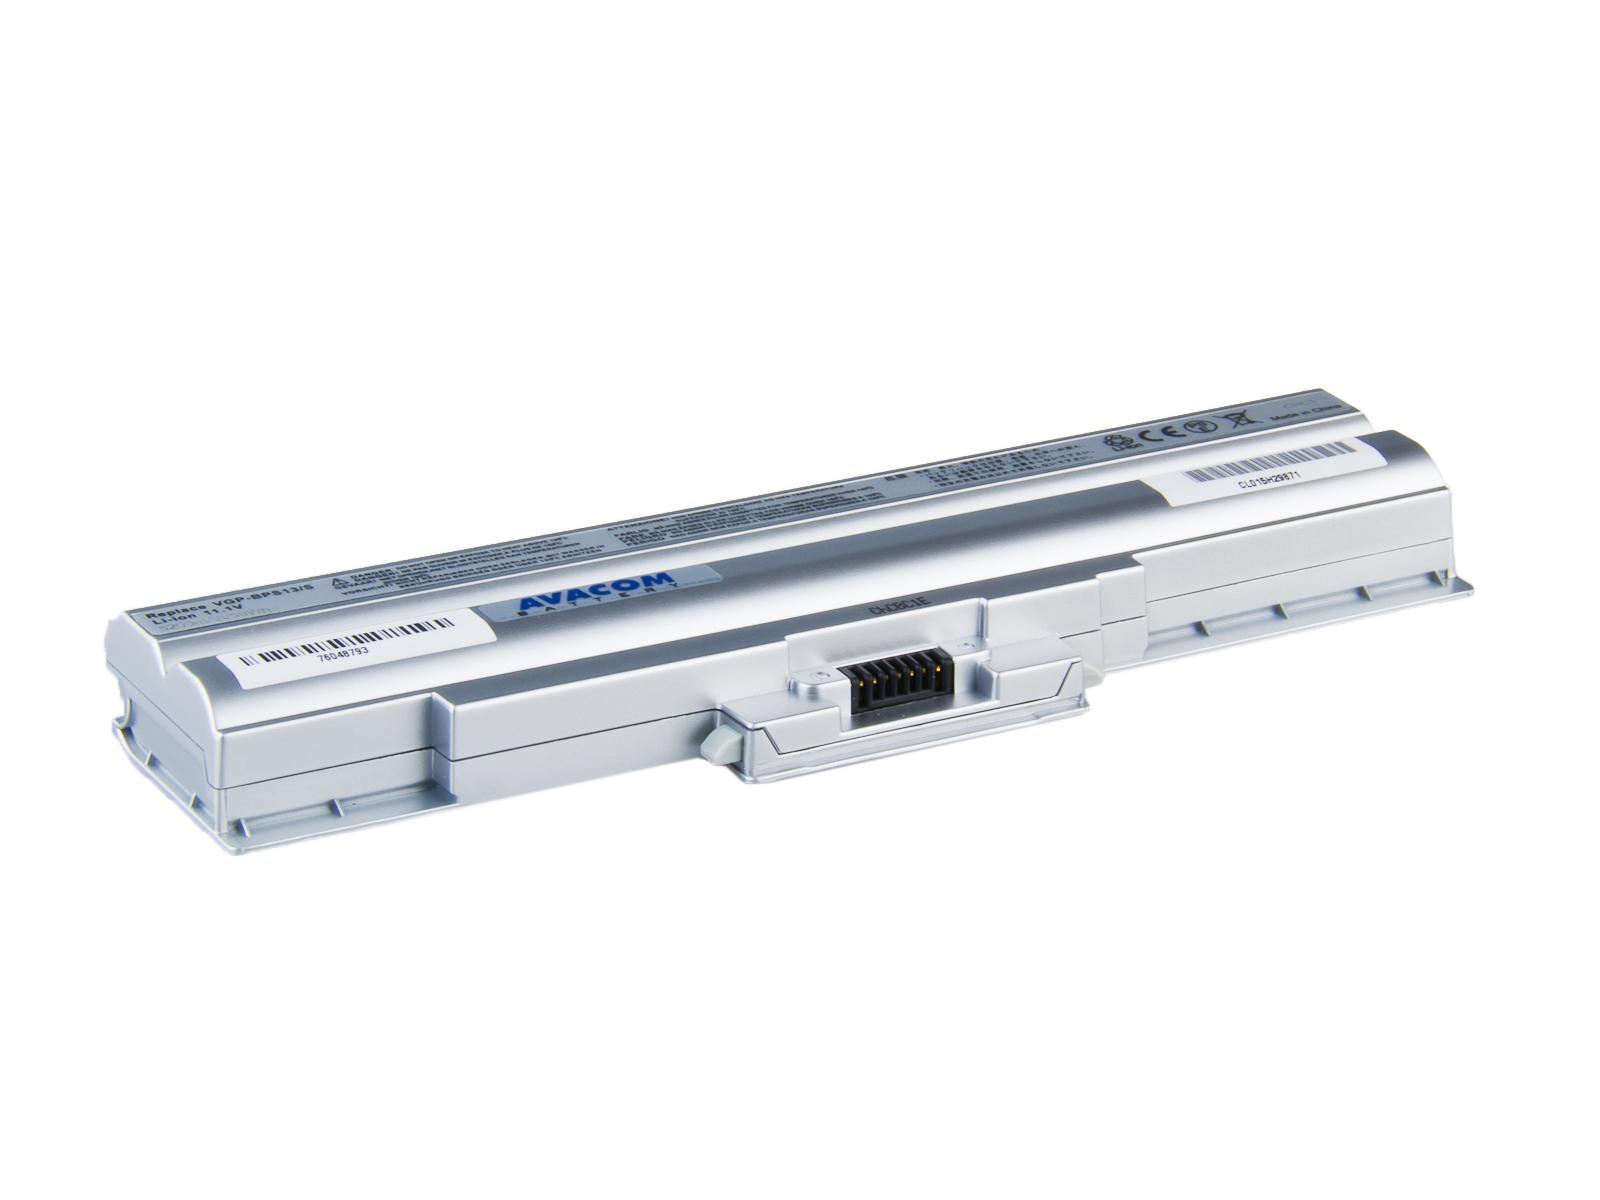 Baterie AVACOM NOSO-13SN-806 pro Sony VGN-FW11, VGP-BPS13 Li-ion 11,1V 5200mAh/58Wh silver